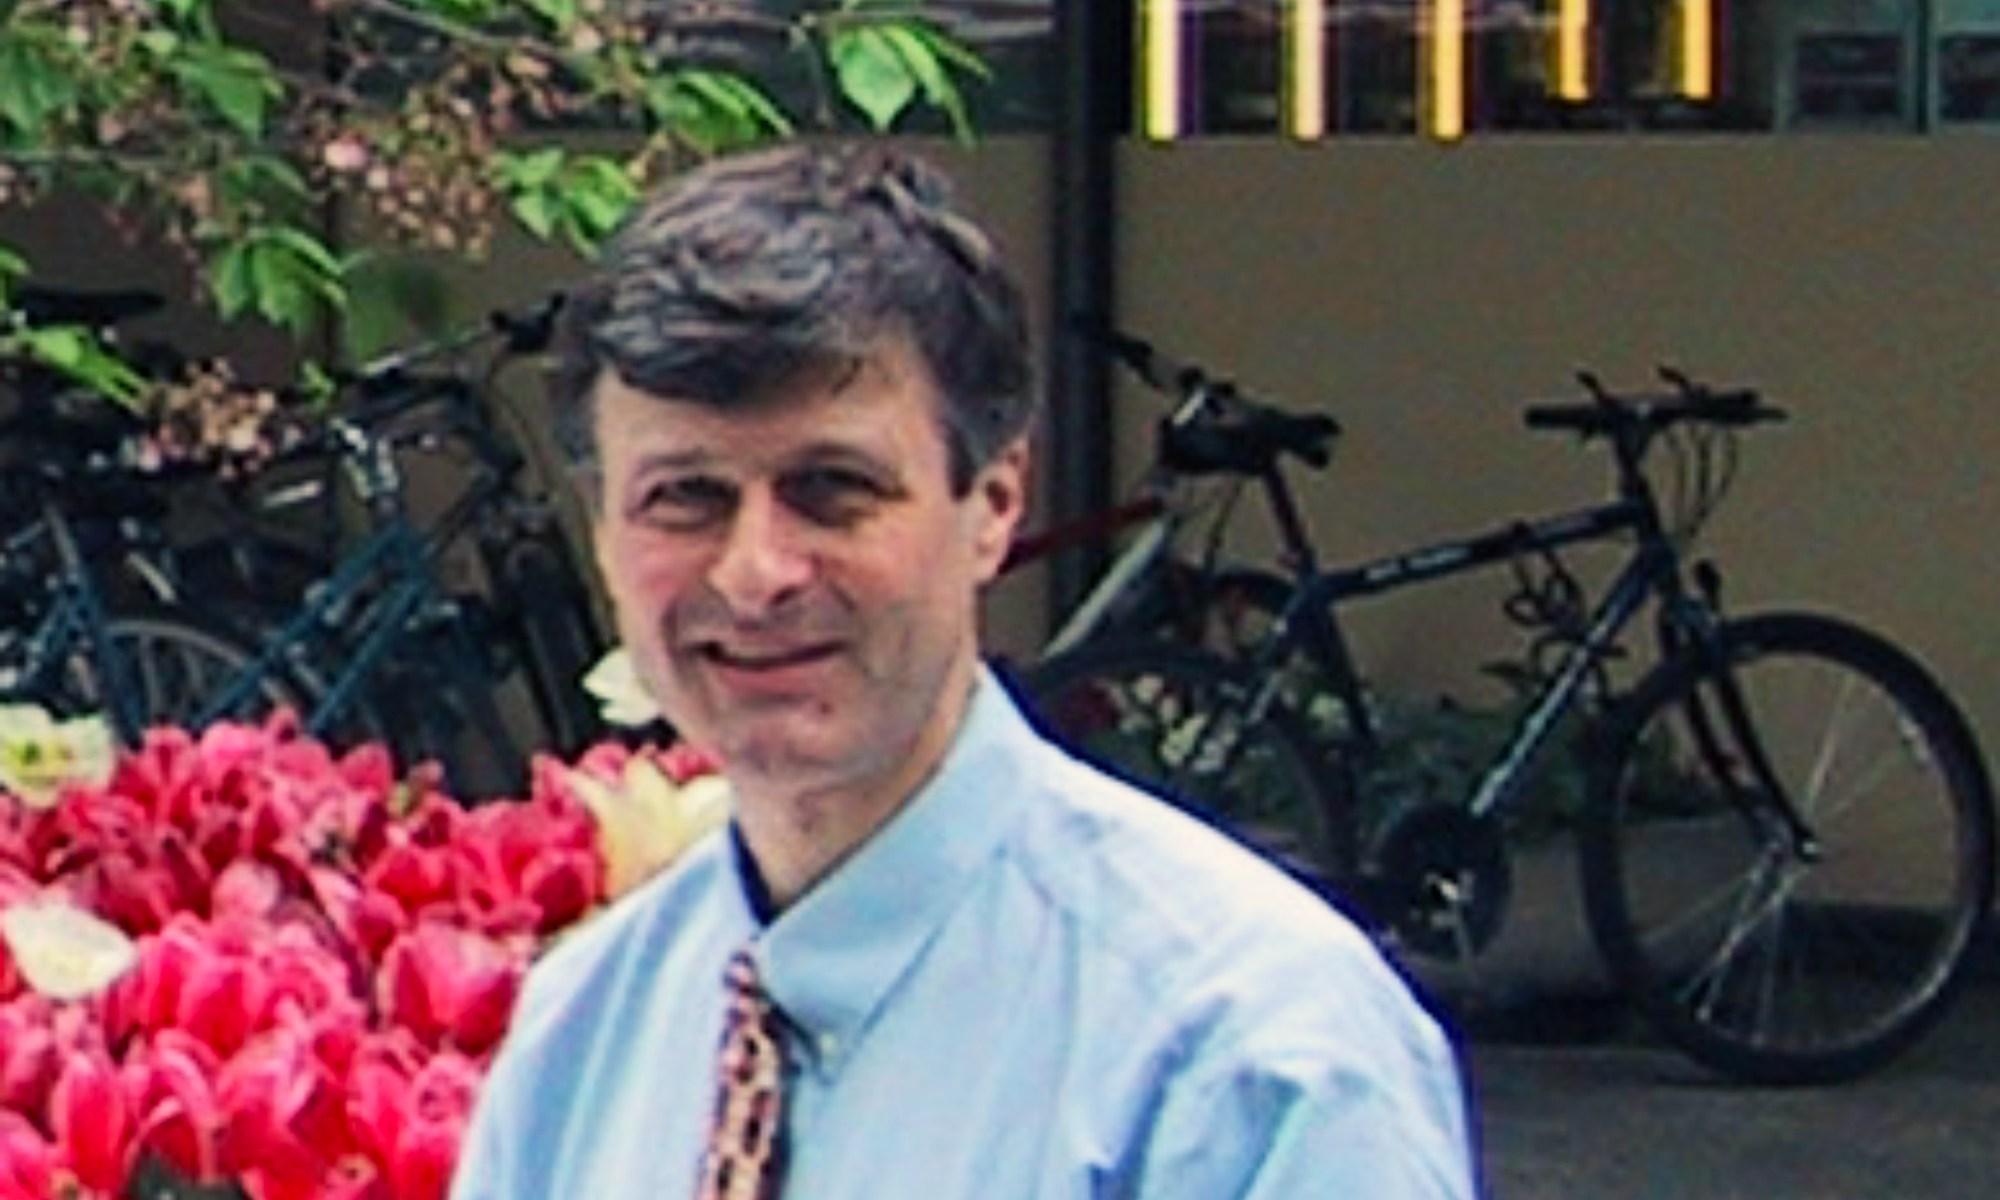 Gerhard Fasol Stanford University talk